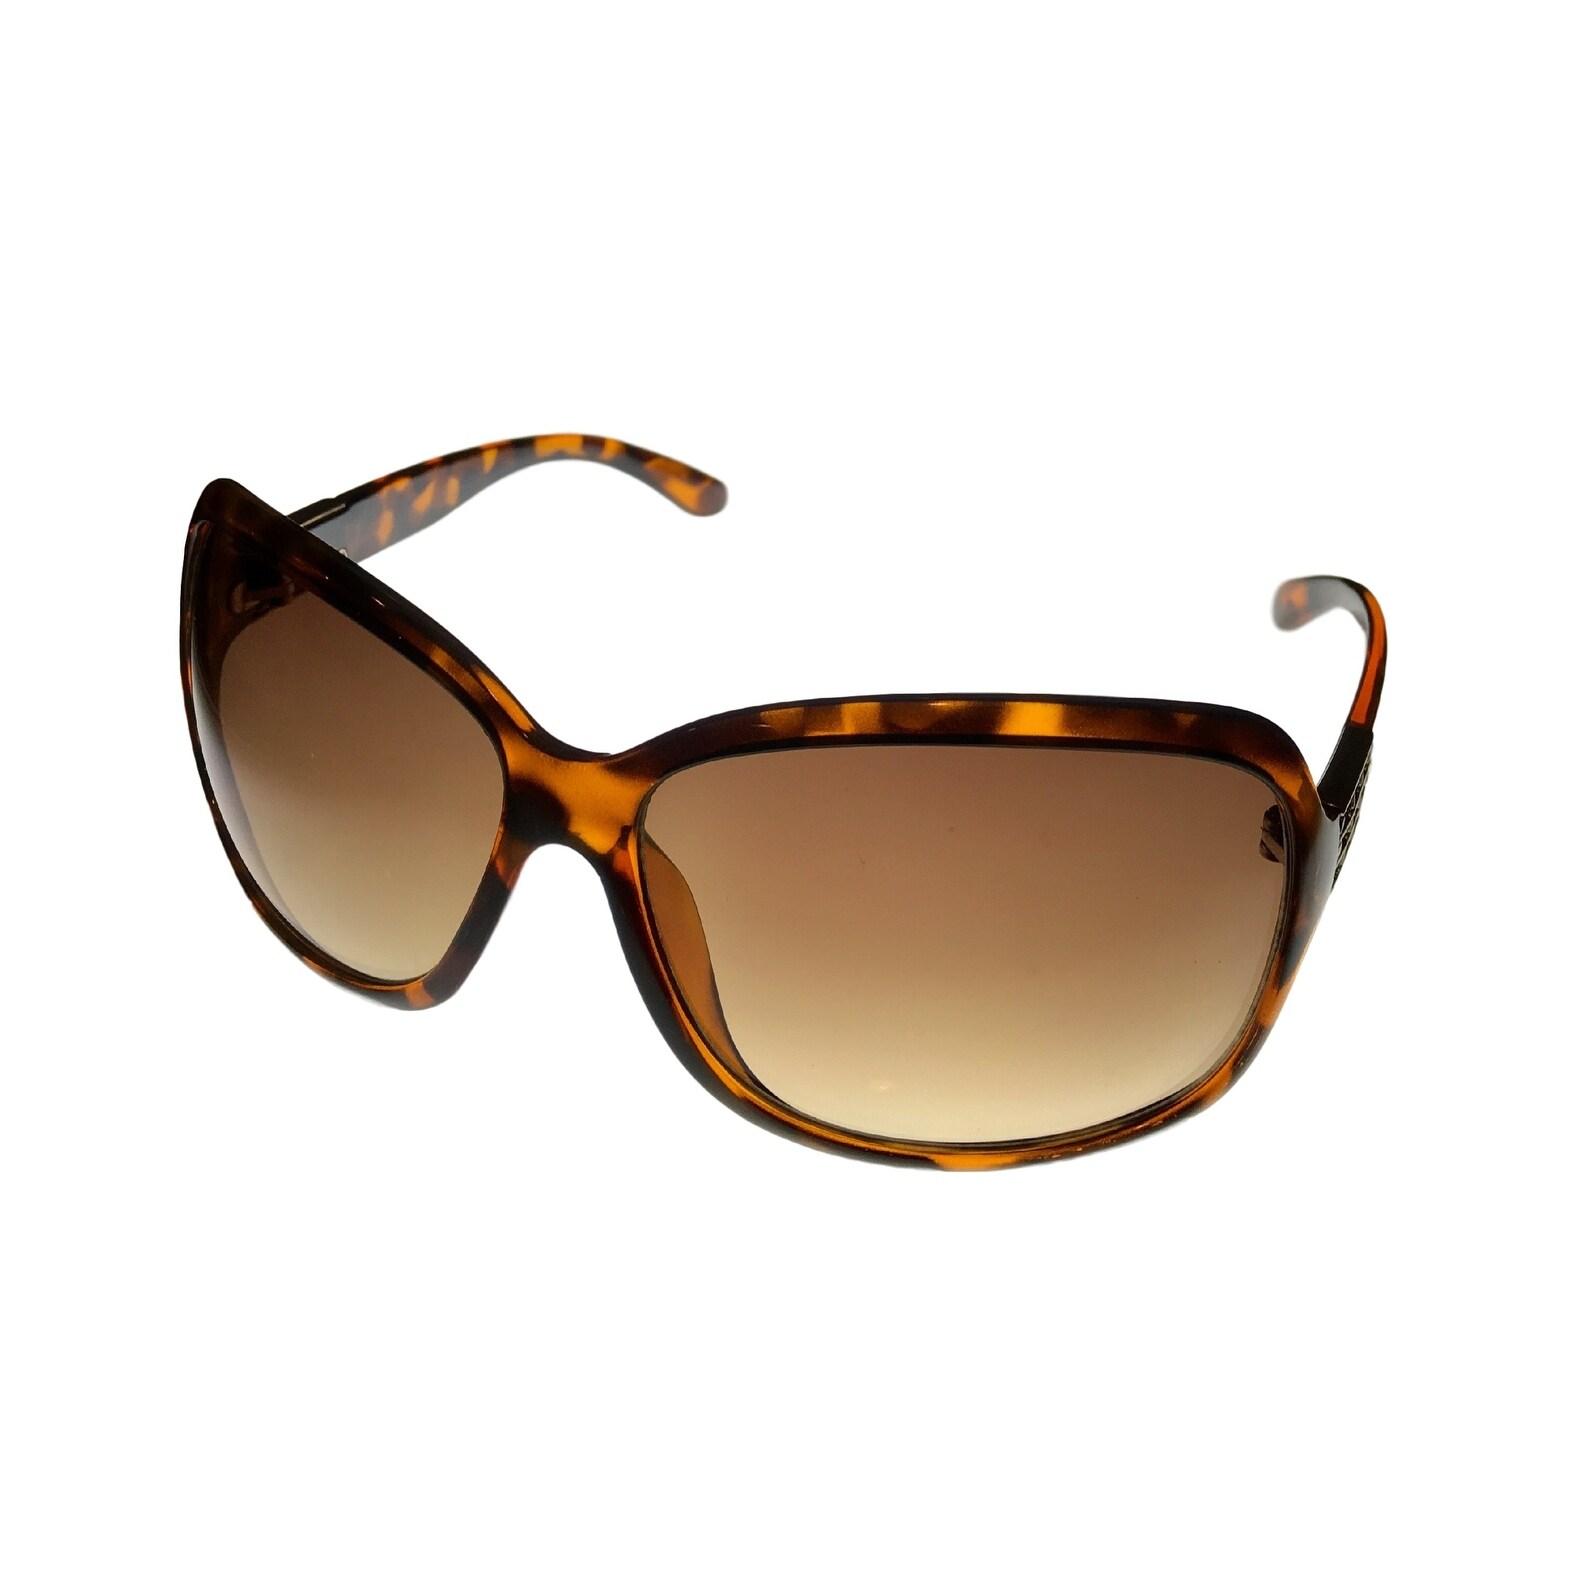 Jill Stuart Womens Sunglass 1026 2 Demi Square Fashion, Gradient Lens - Medium - Thumbnail 0